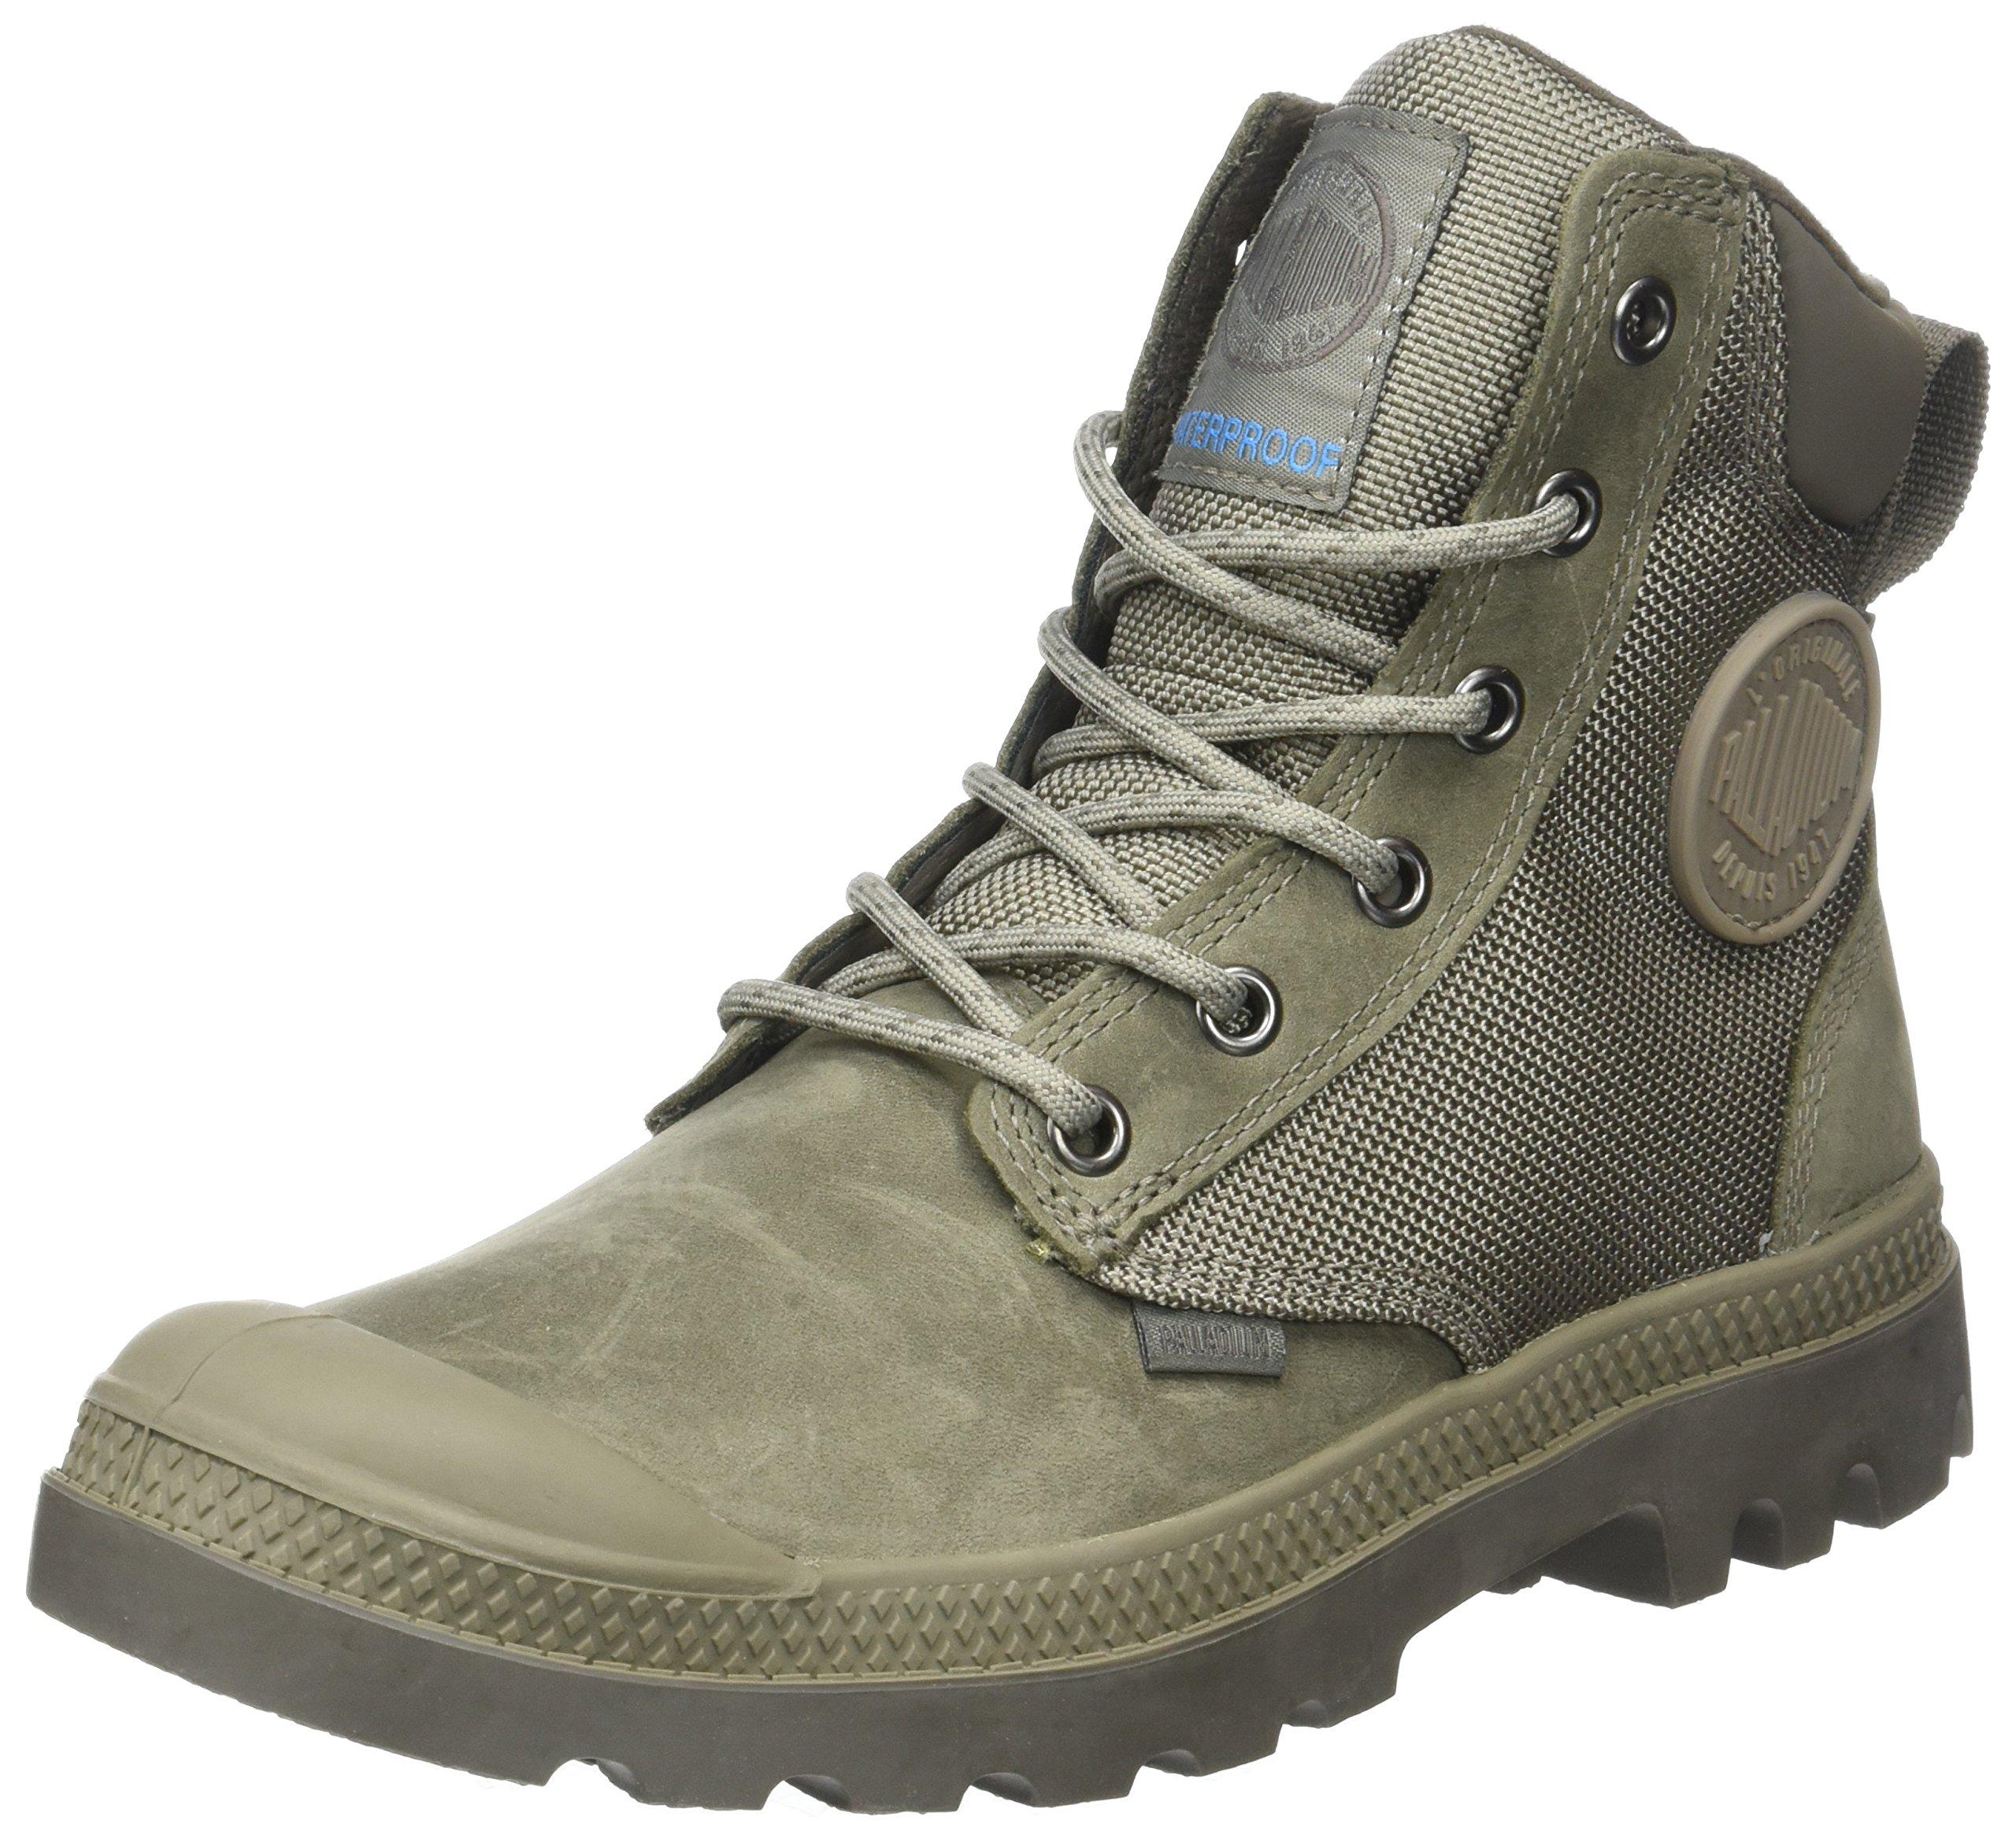 Palladium Men's Pampa Sport Cuff Wpn Boots, Grey, 8 US